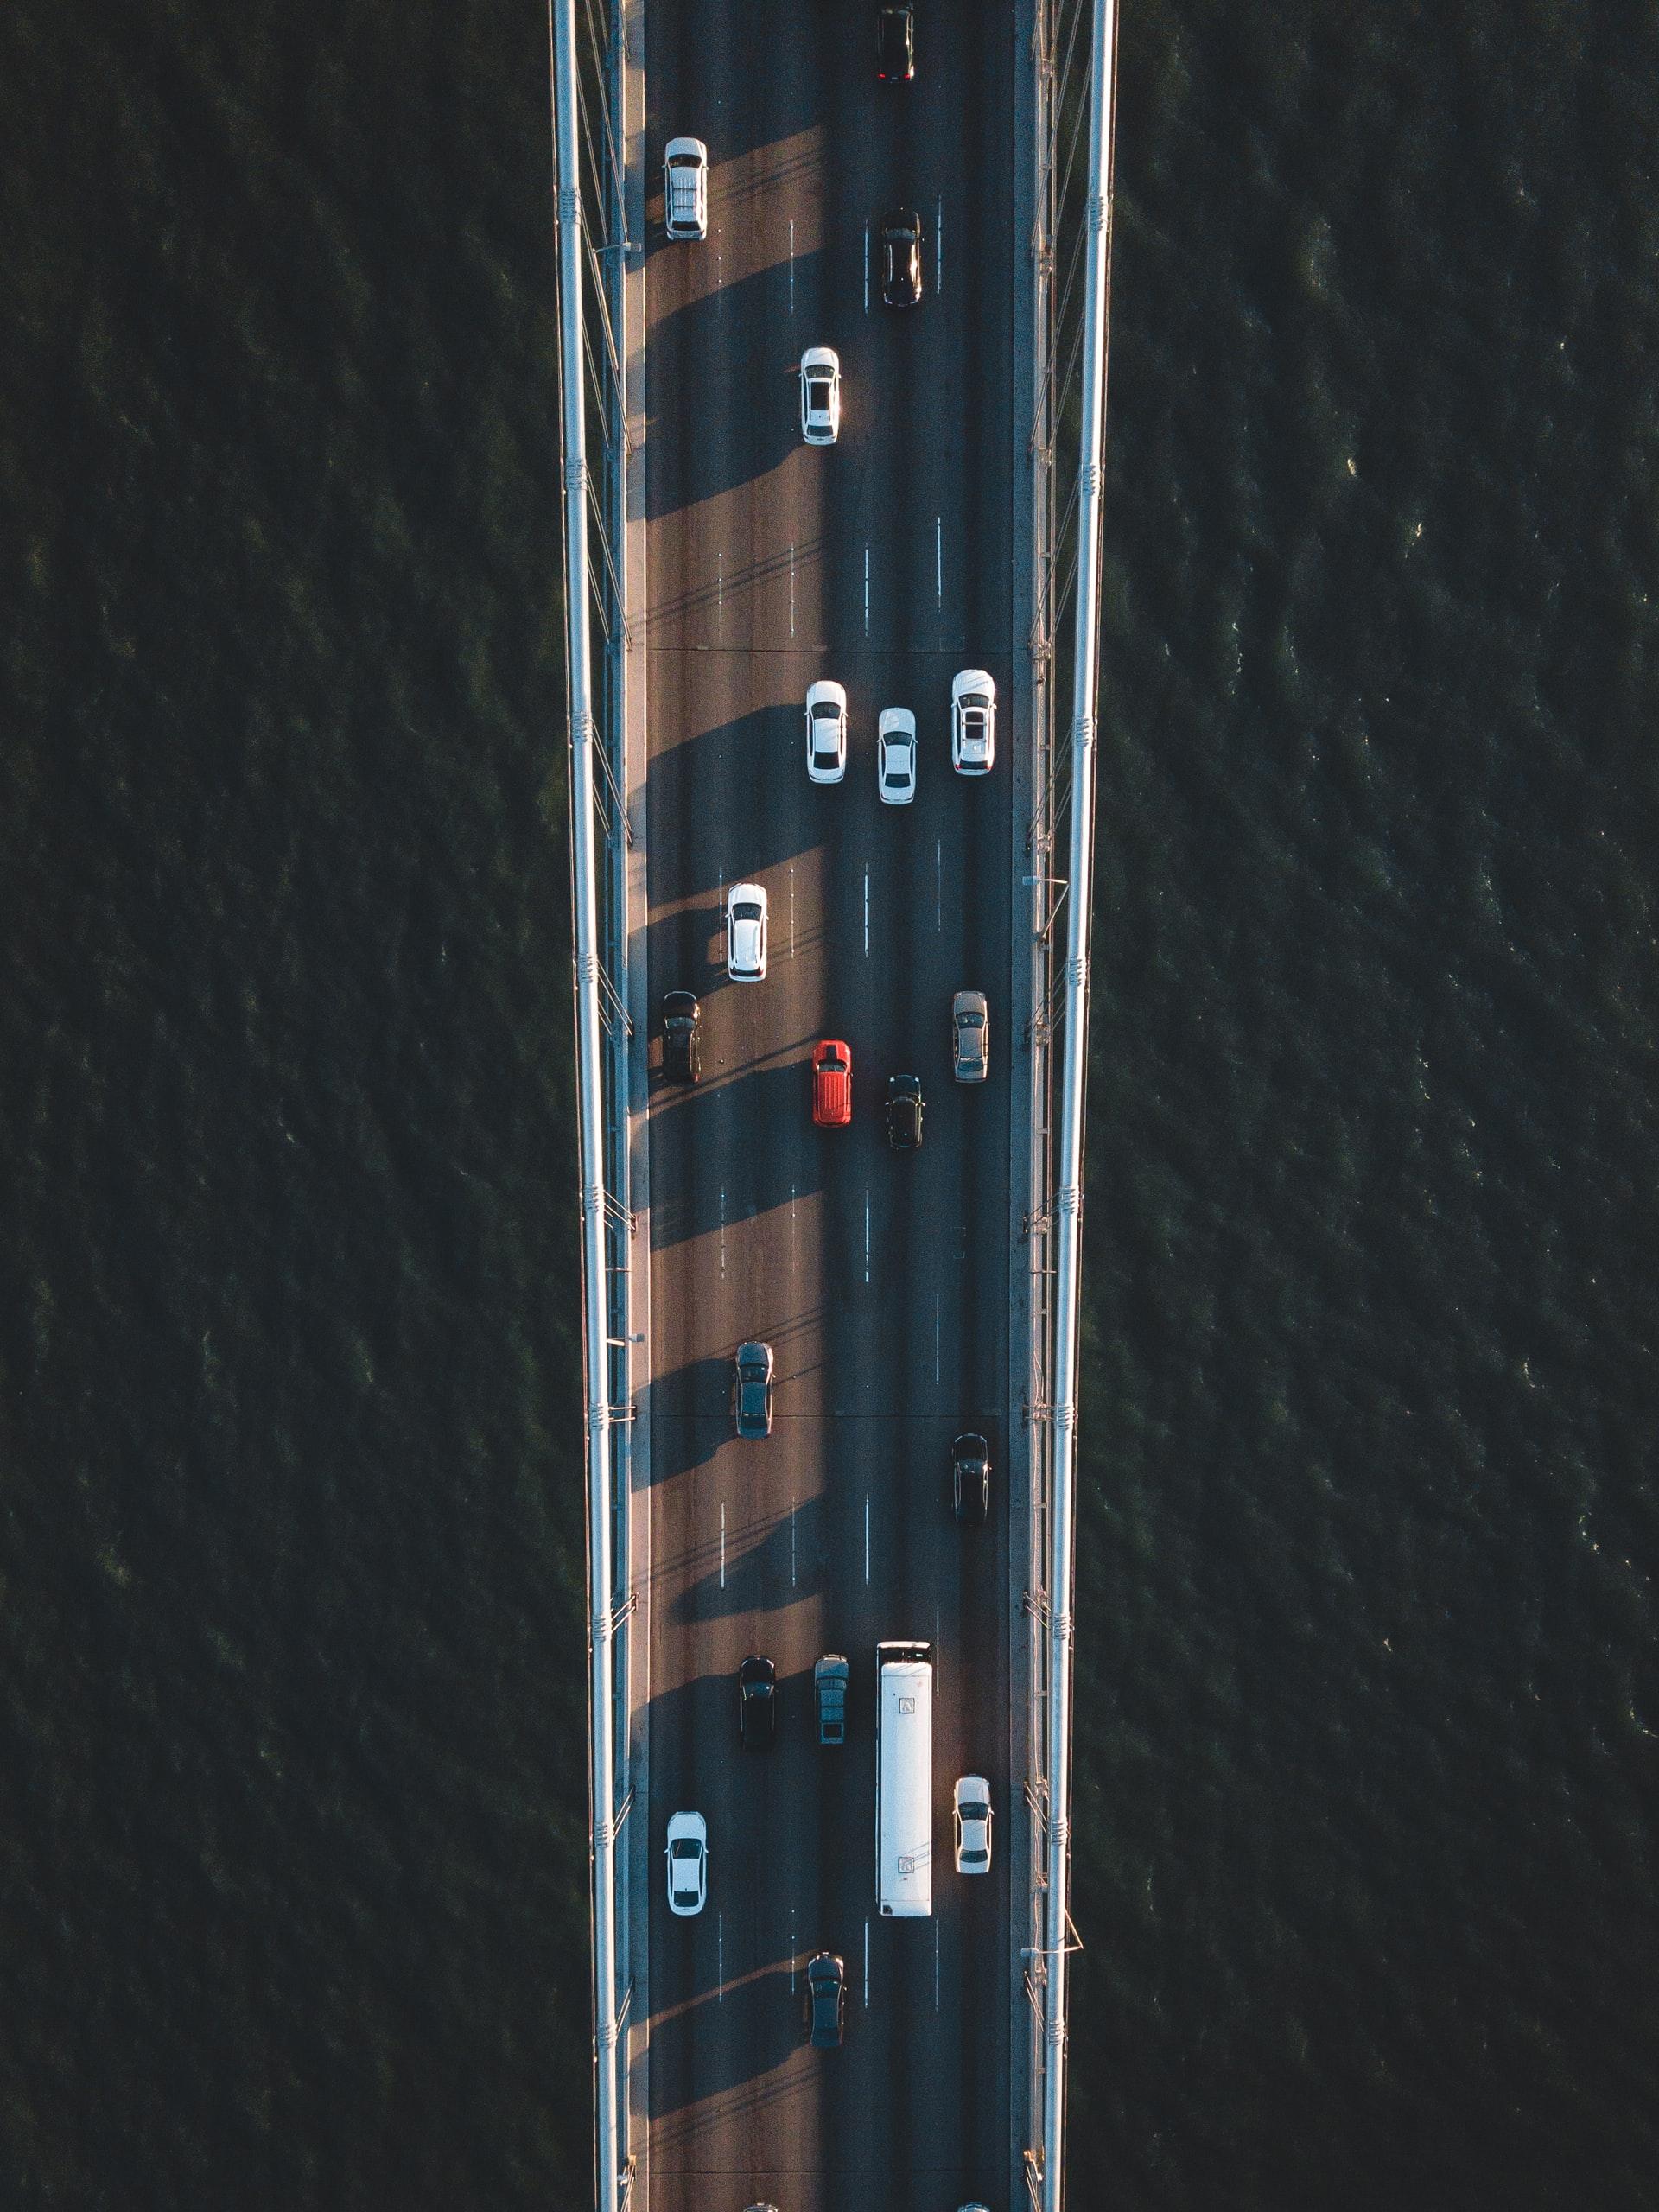 cars on a highway bridge